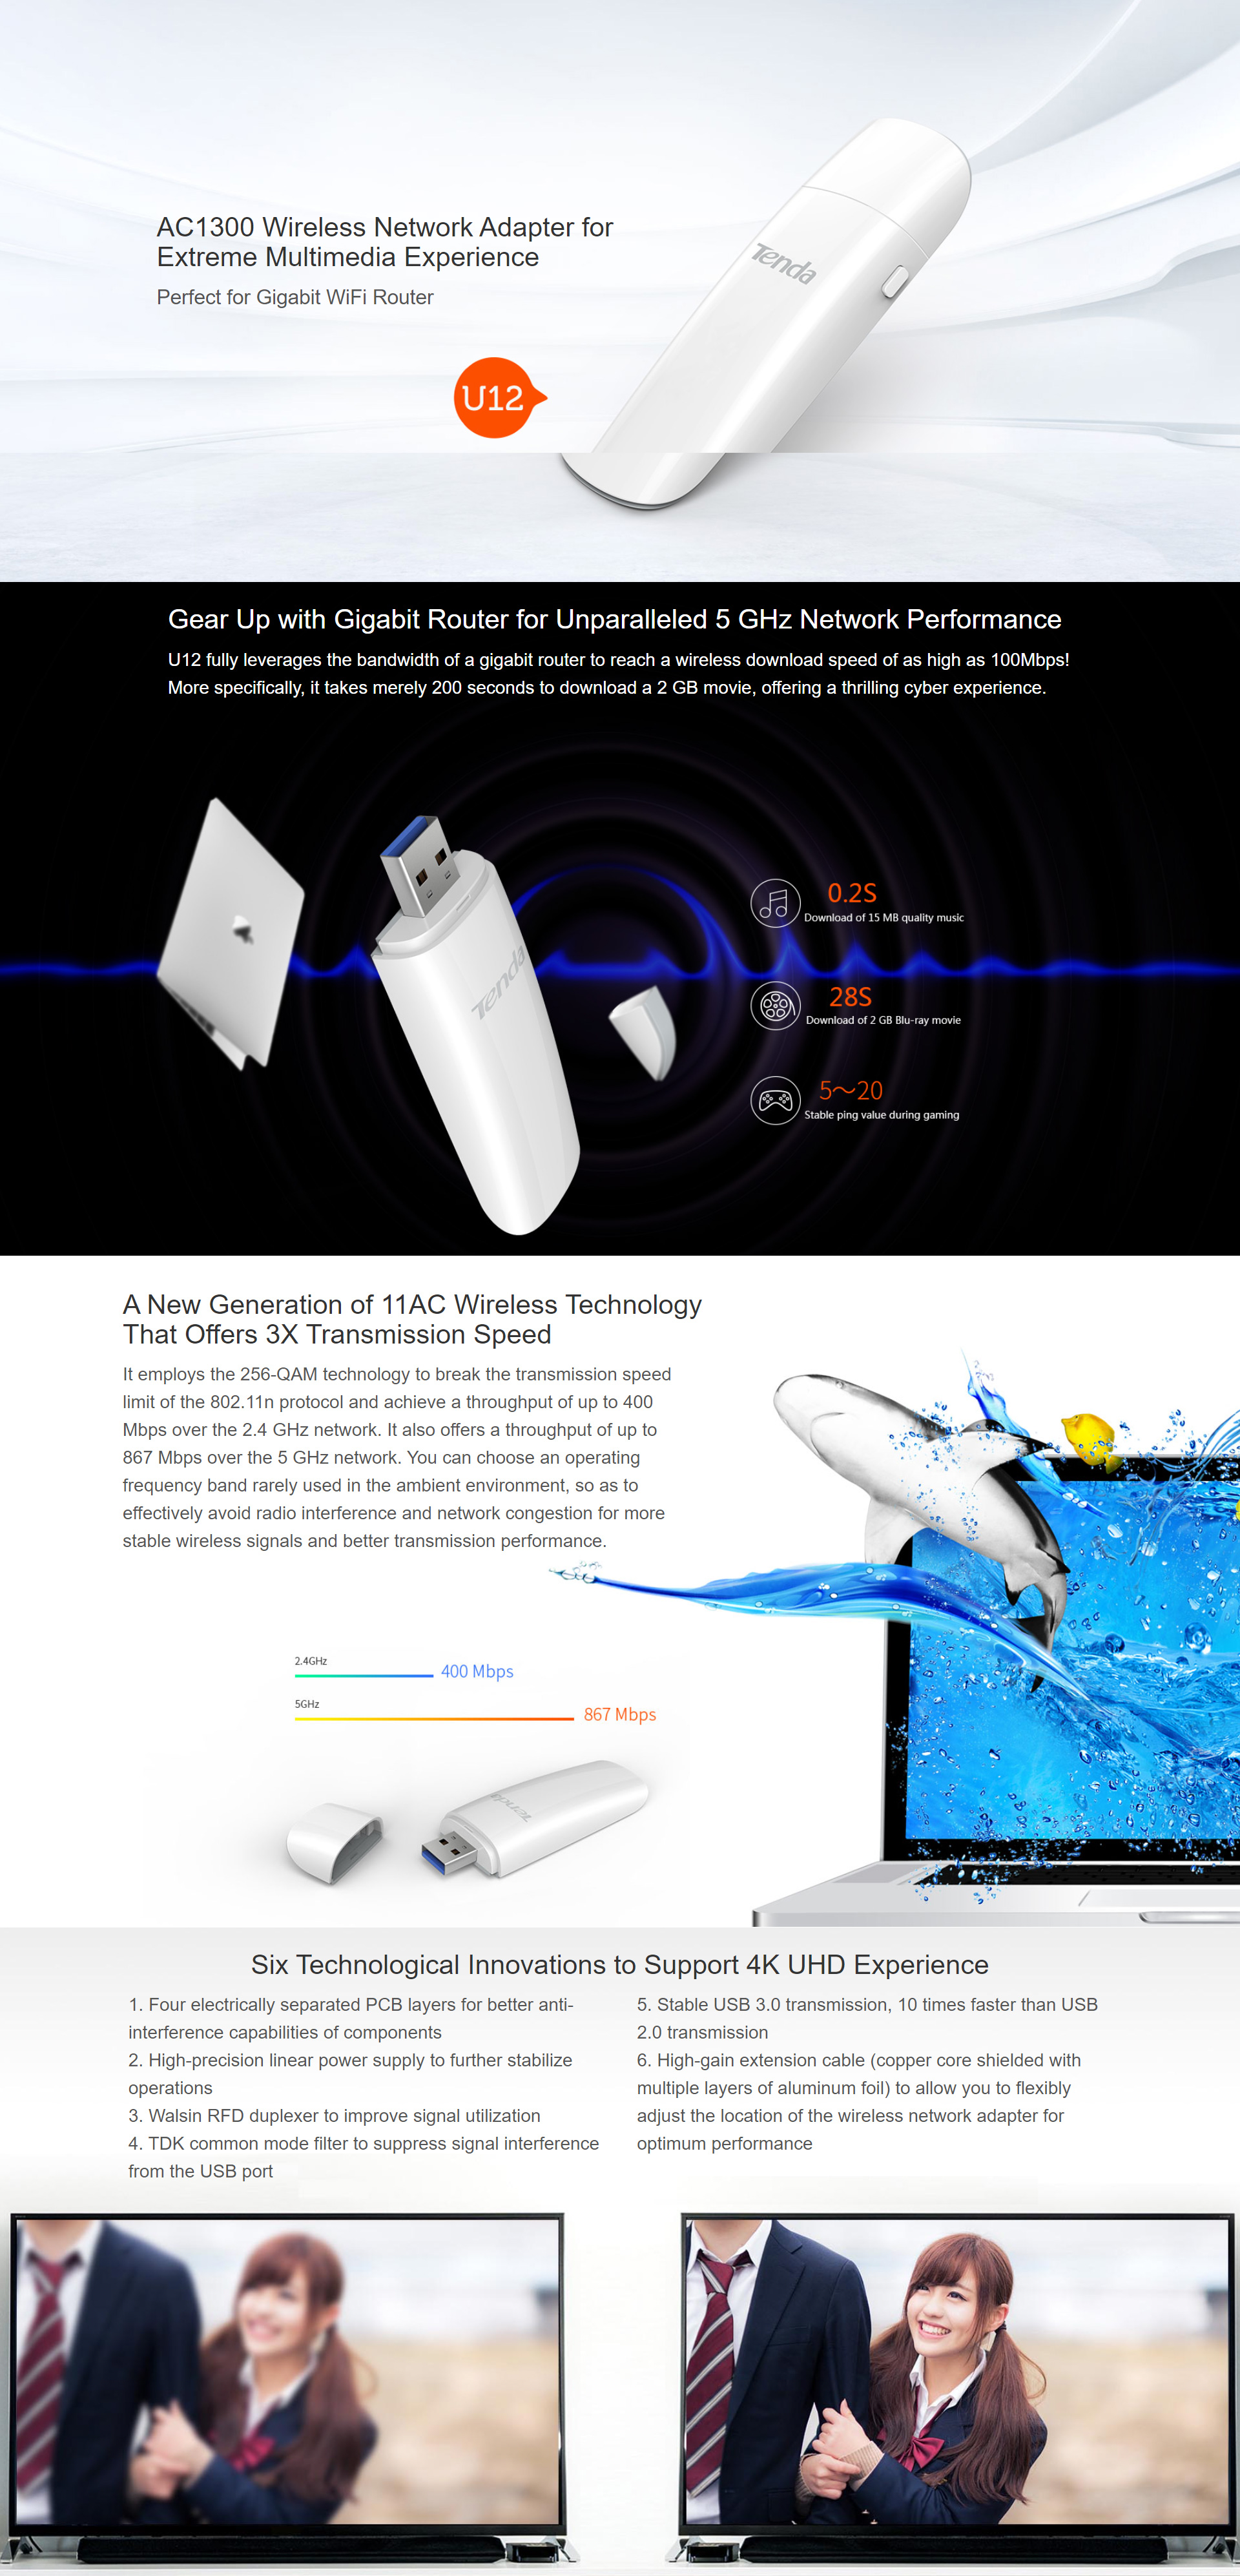 screencapture-tendacn-au-product-U12-html-2021-08-02-09_50_50.jpg